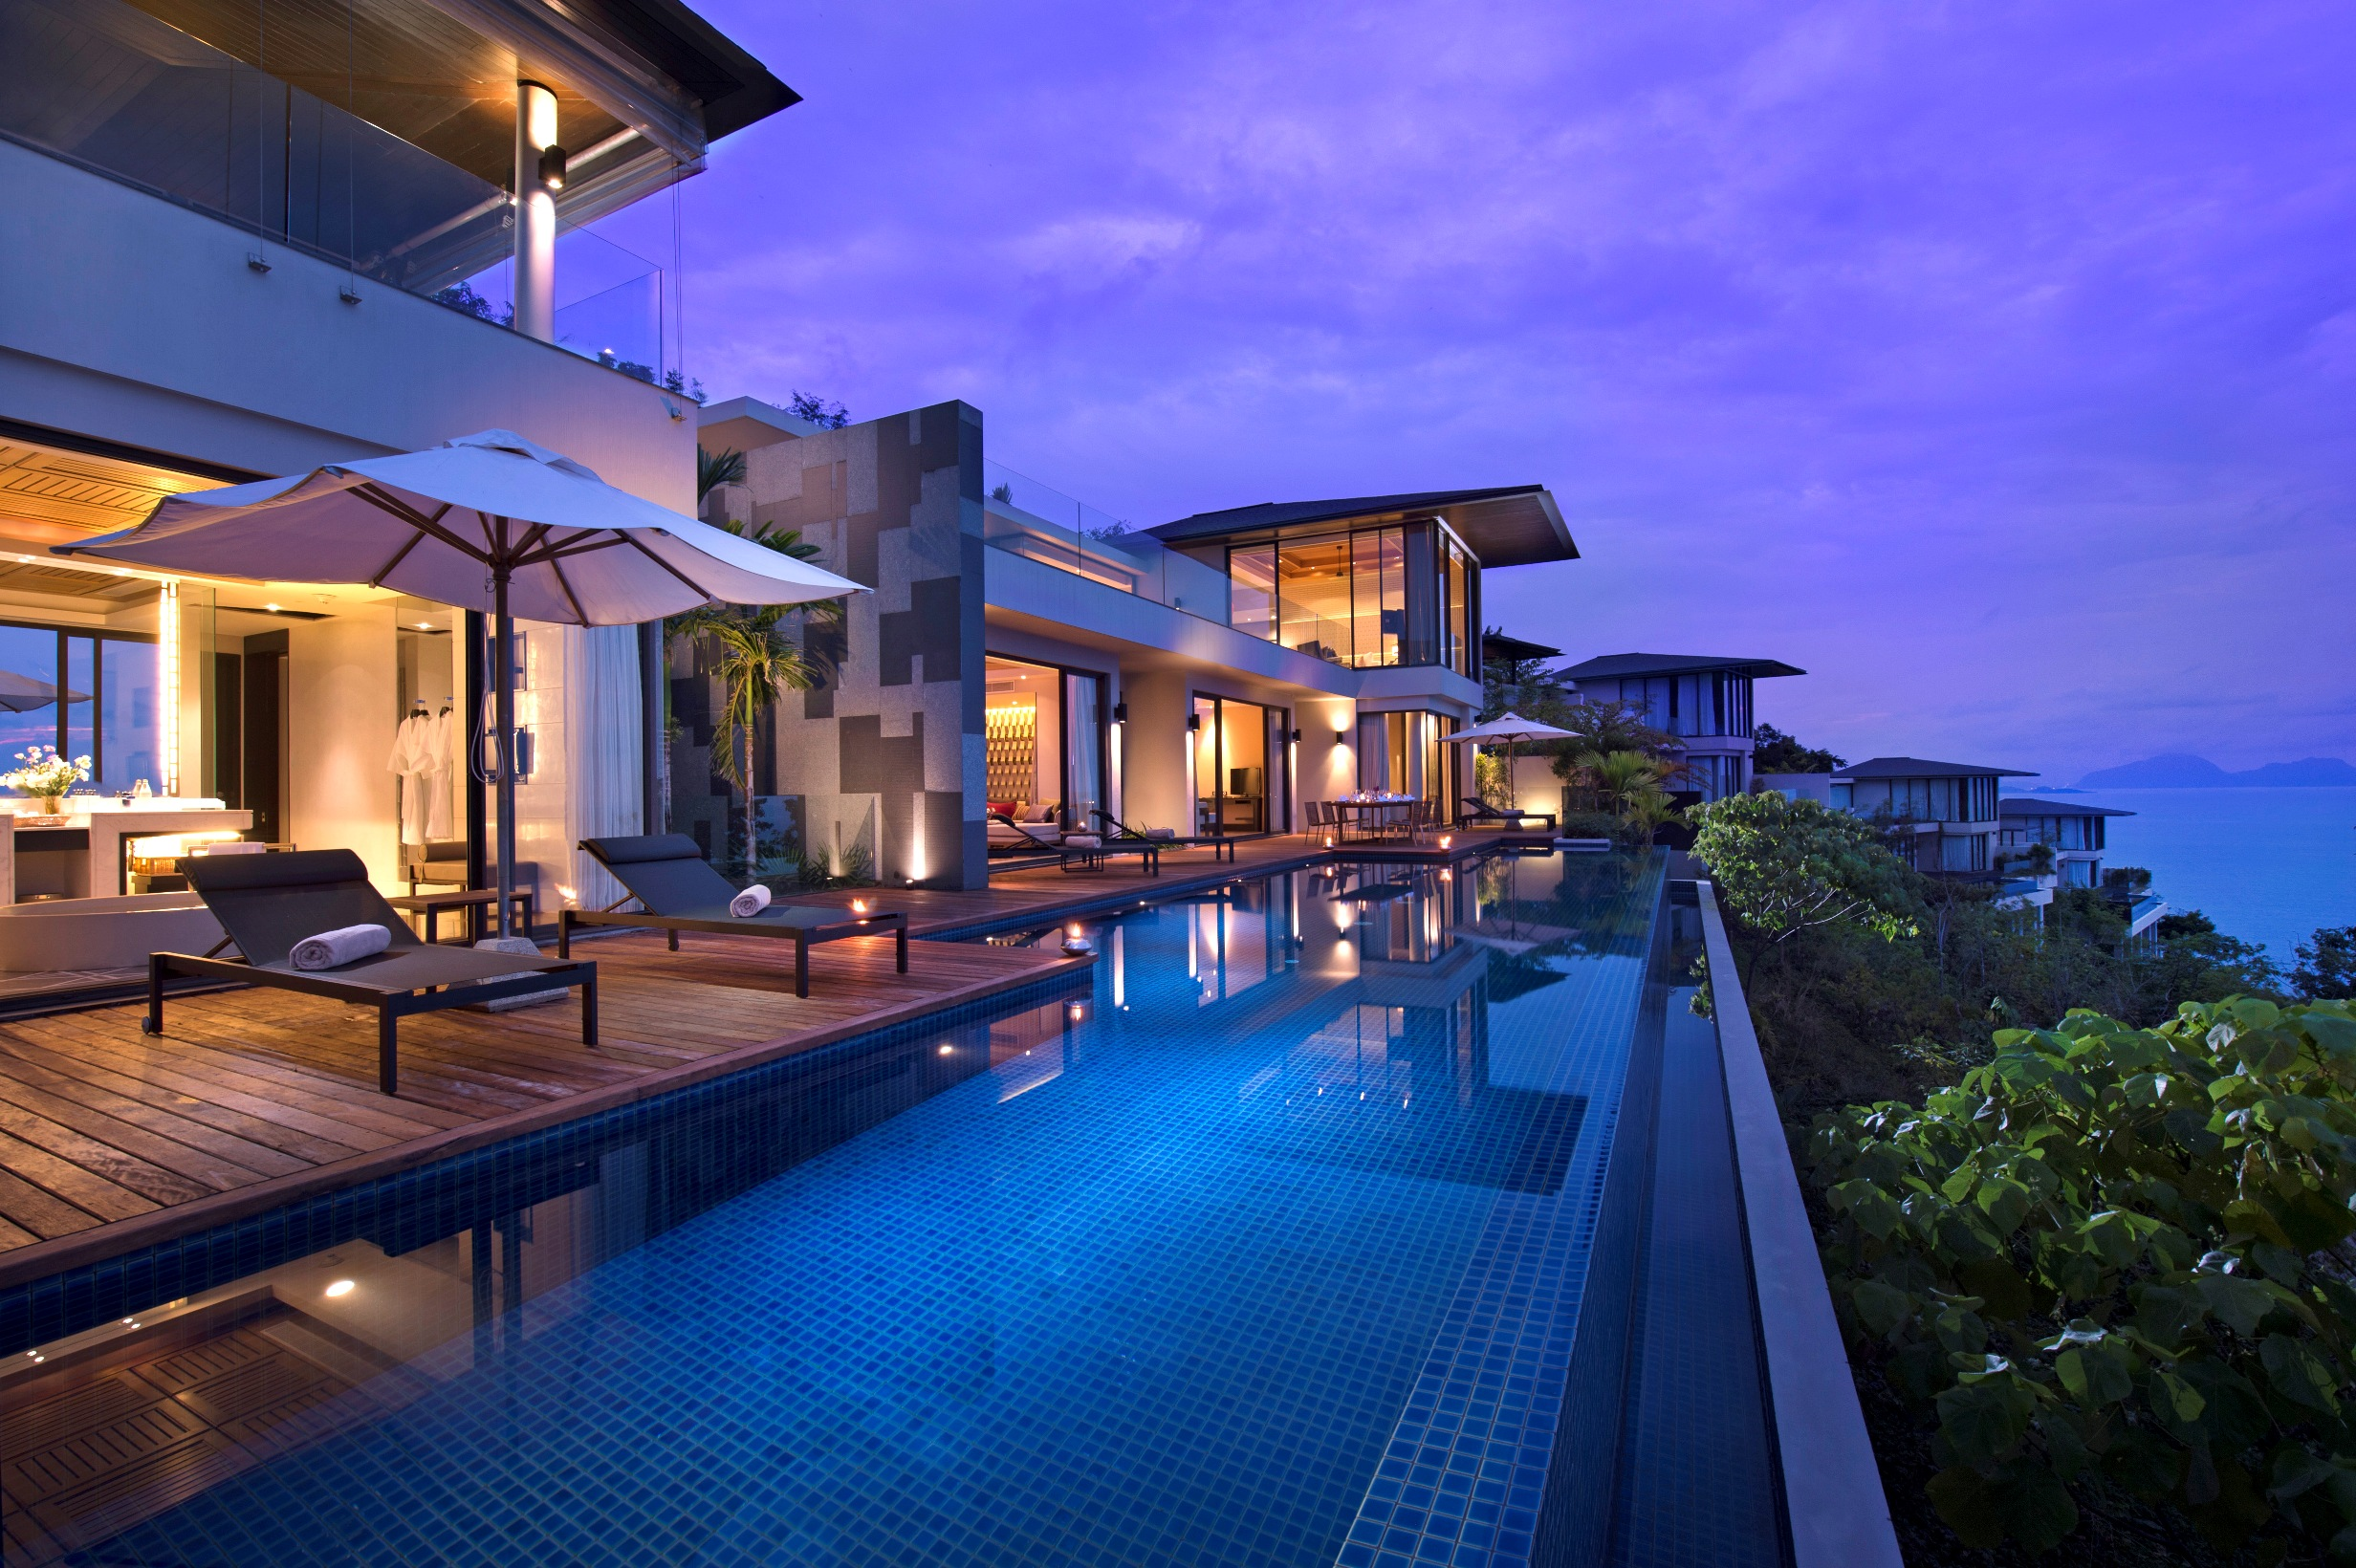 Conrad Koh Samui Introduces Oceanview Three Bedroom Pool Villa